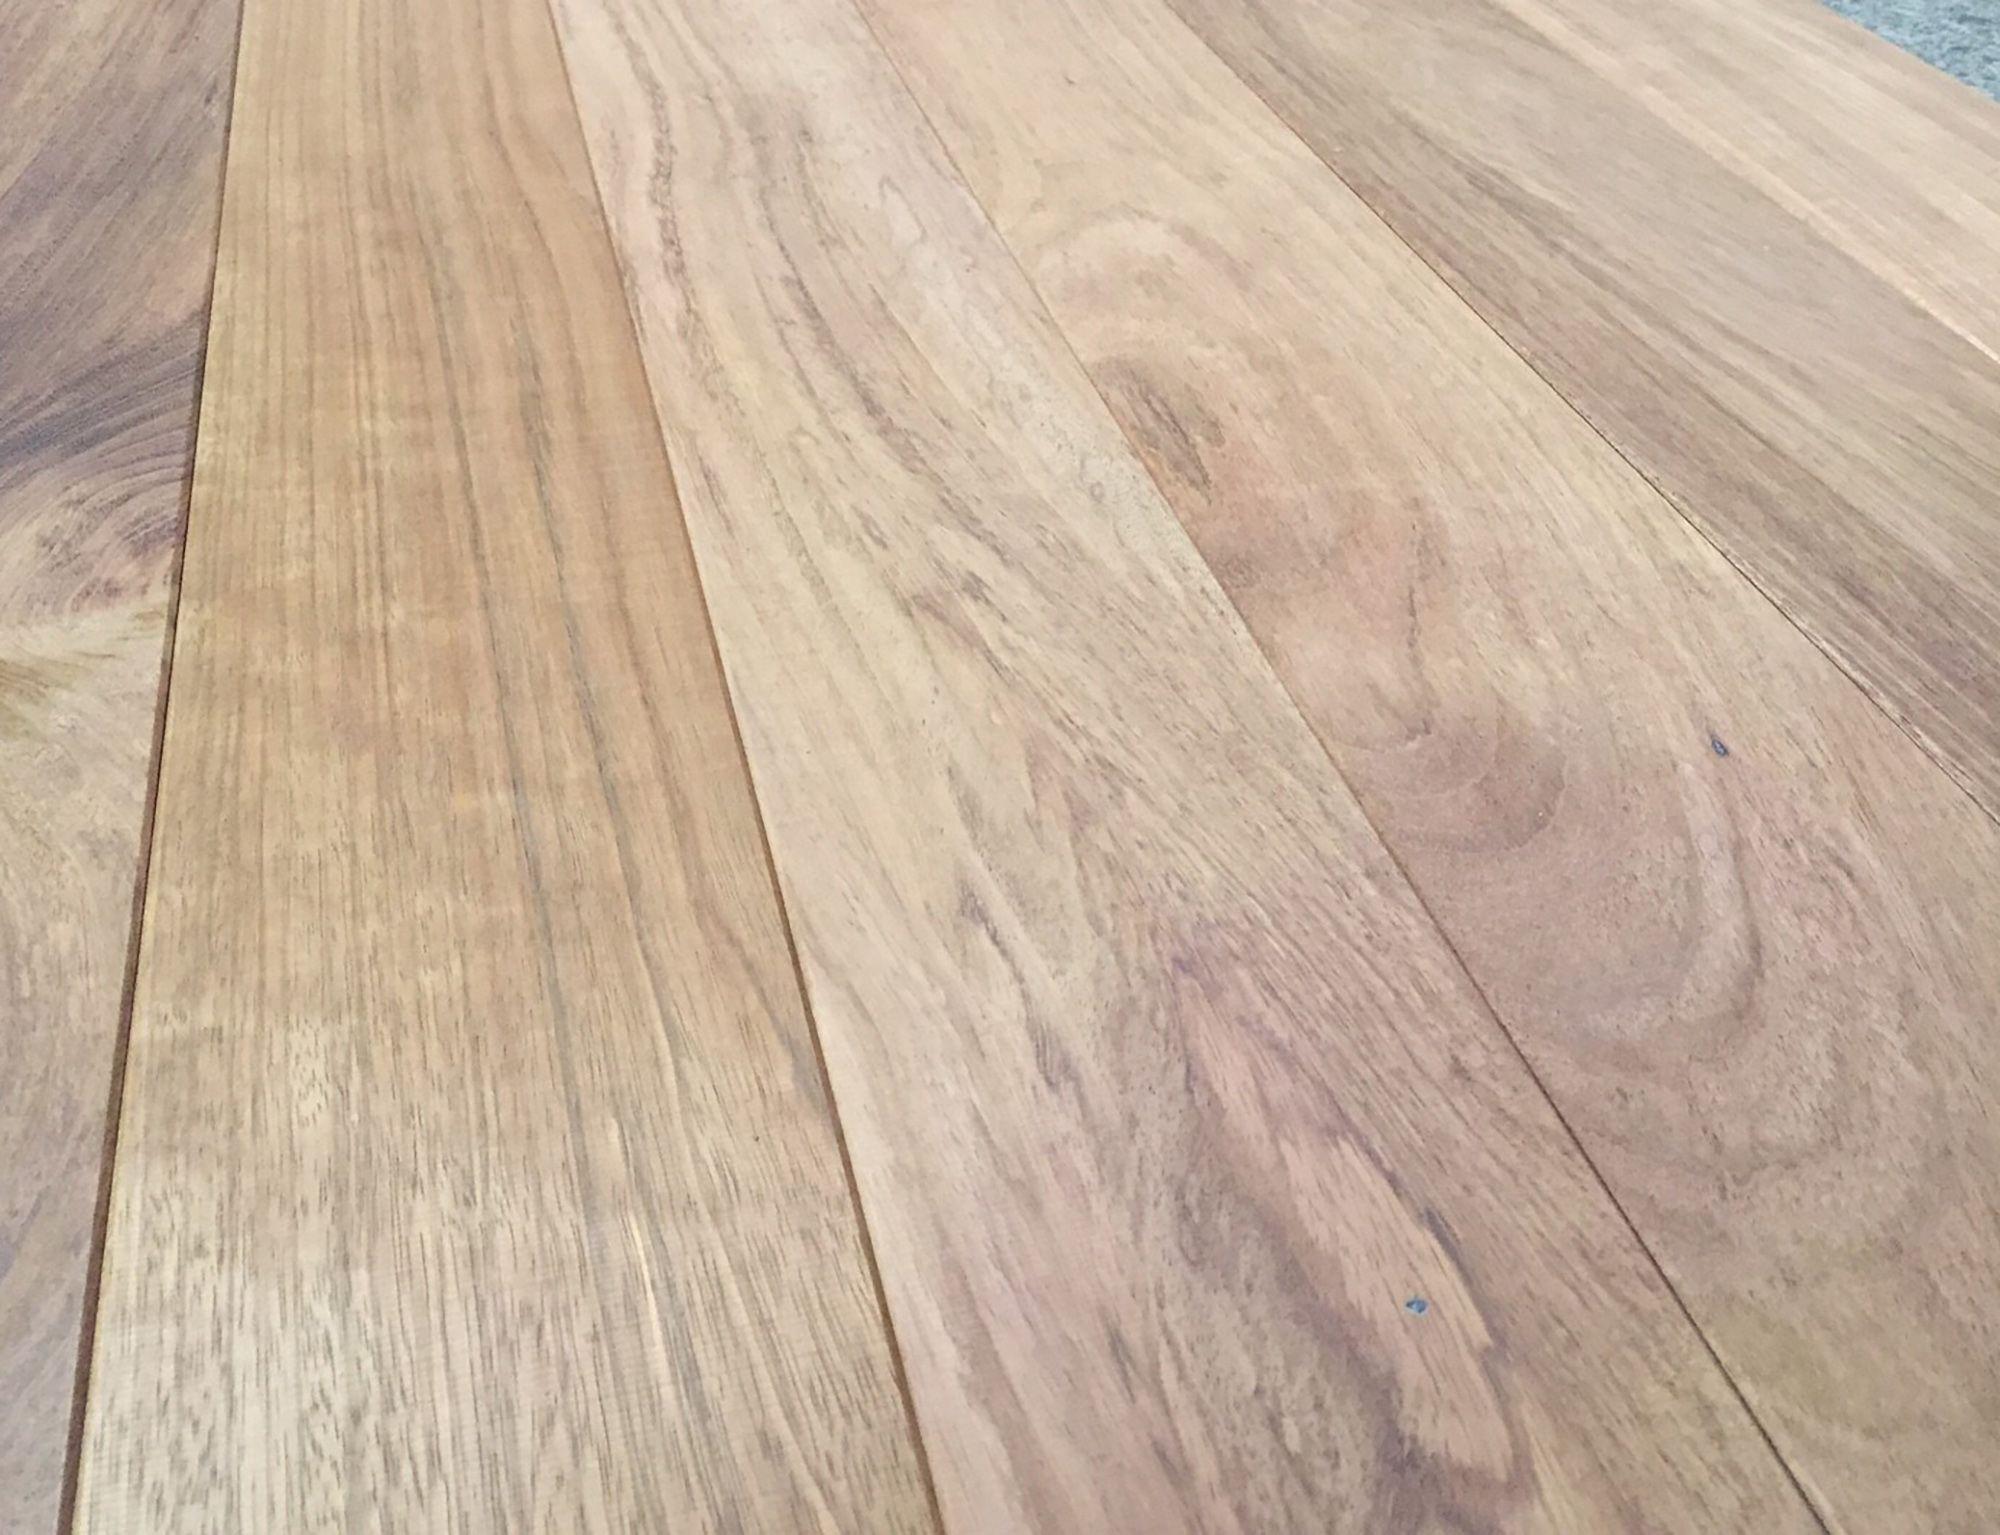 unfinished hardwood flooring atlanta of cherry hardwood flooring scandian wood floors brazilian cherry with regard to floors 50 s cherry hardwood flooring tungston hardwood flooring brazilian unfinished collection